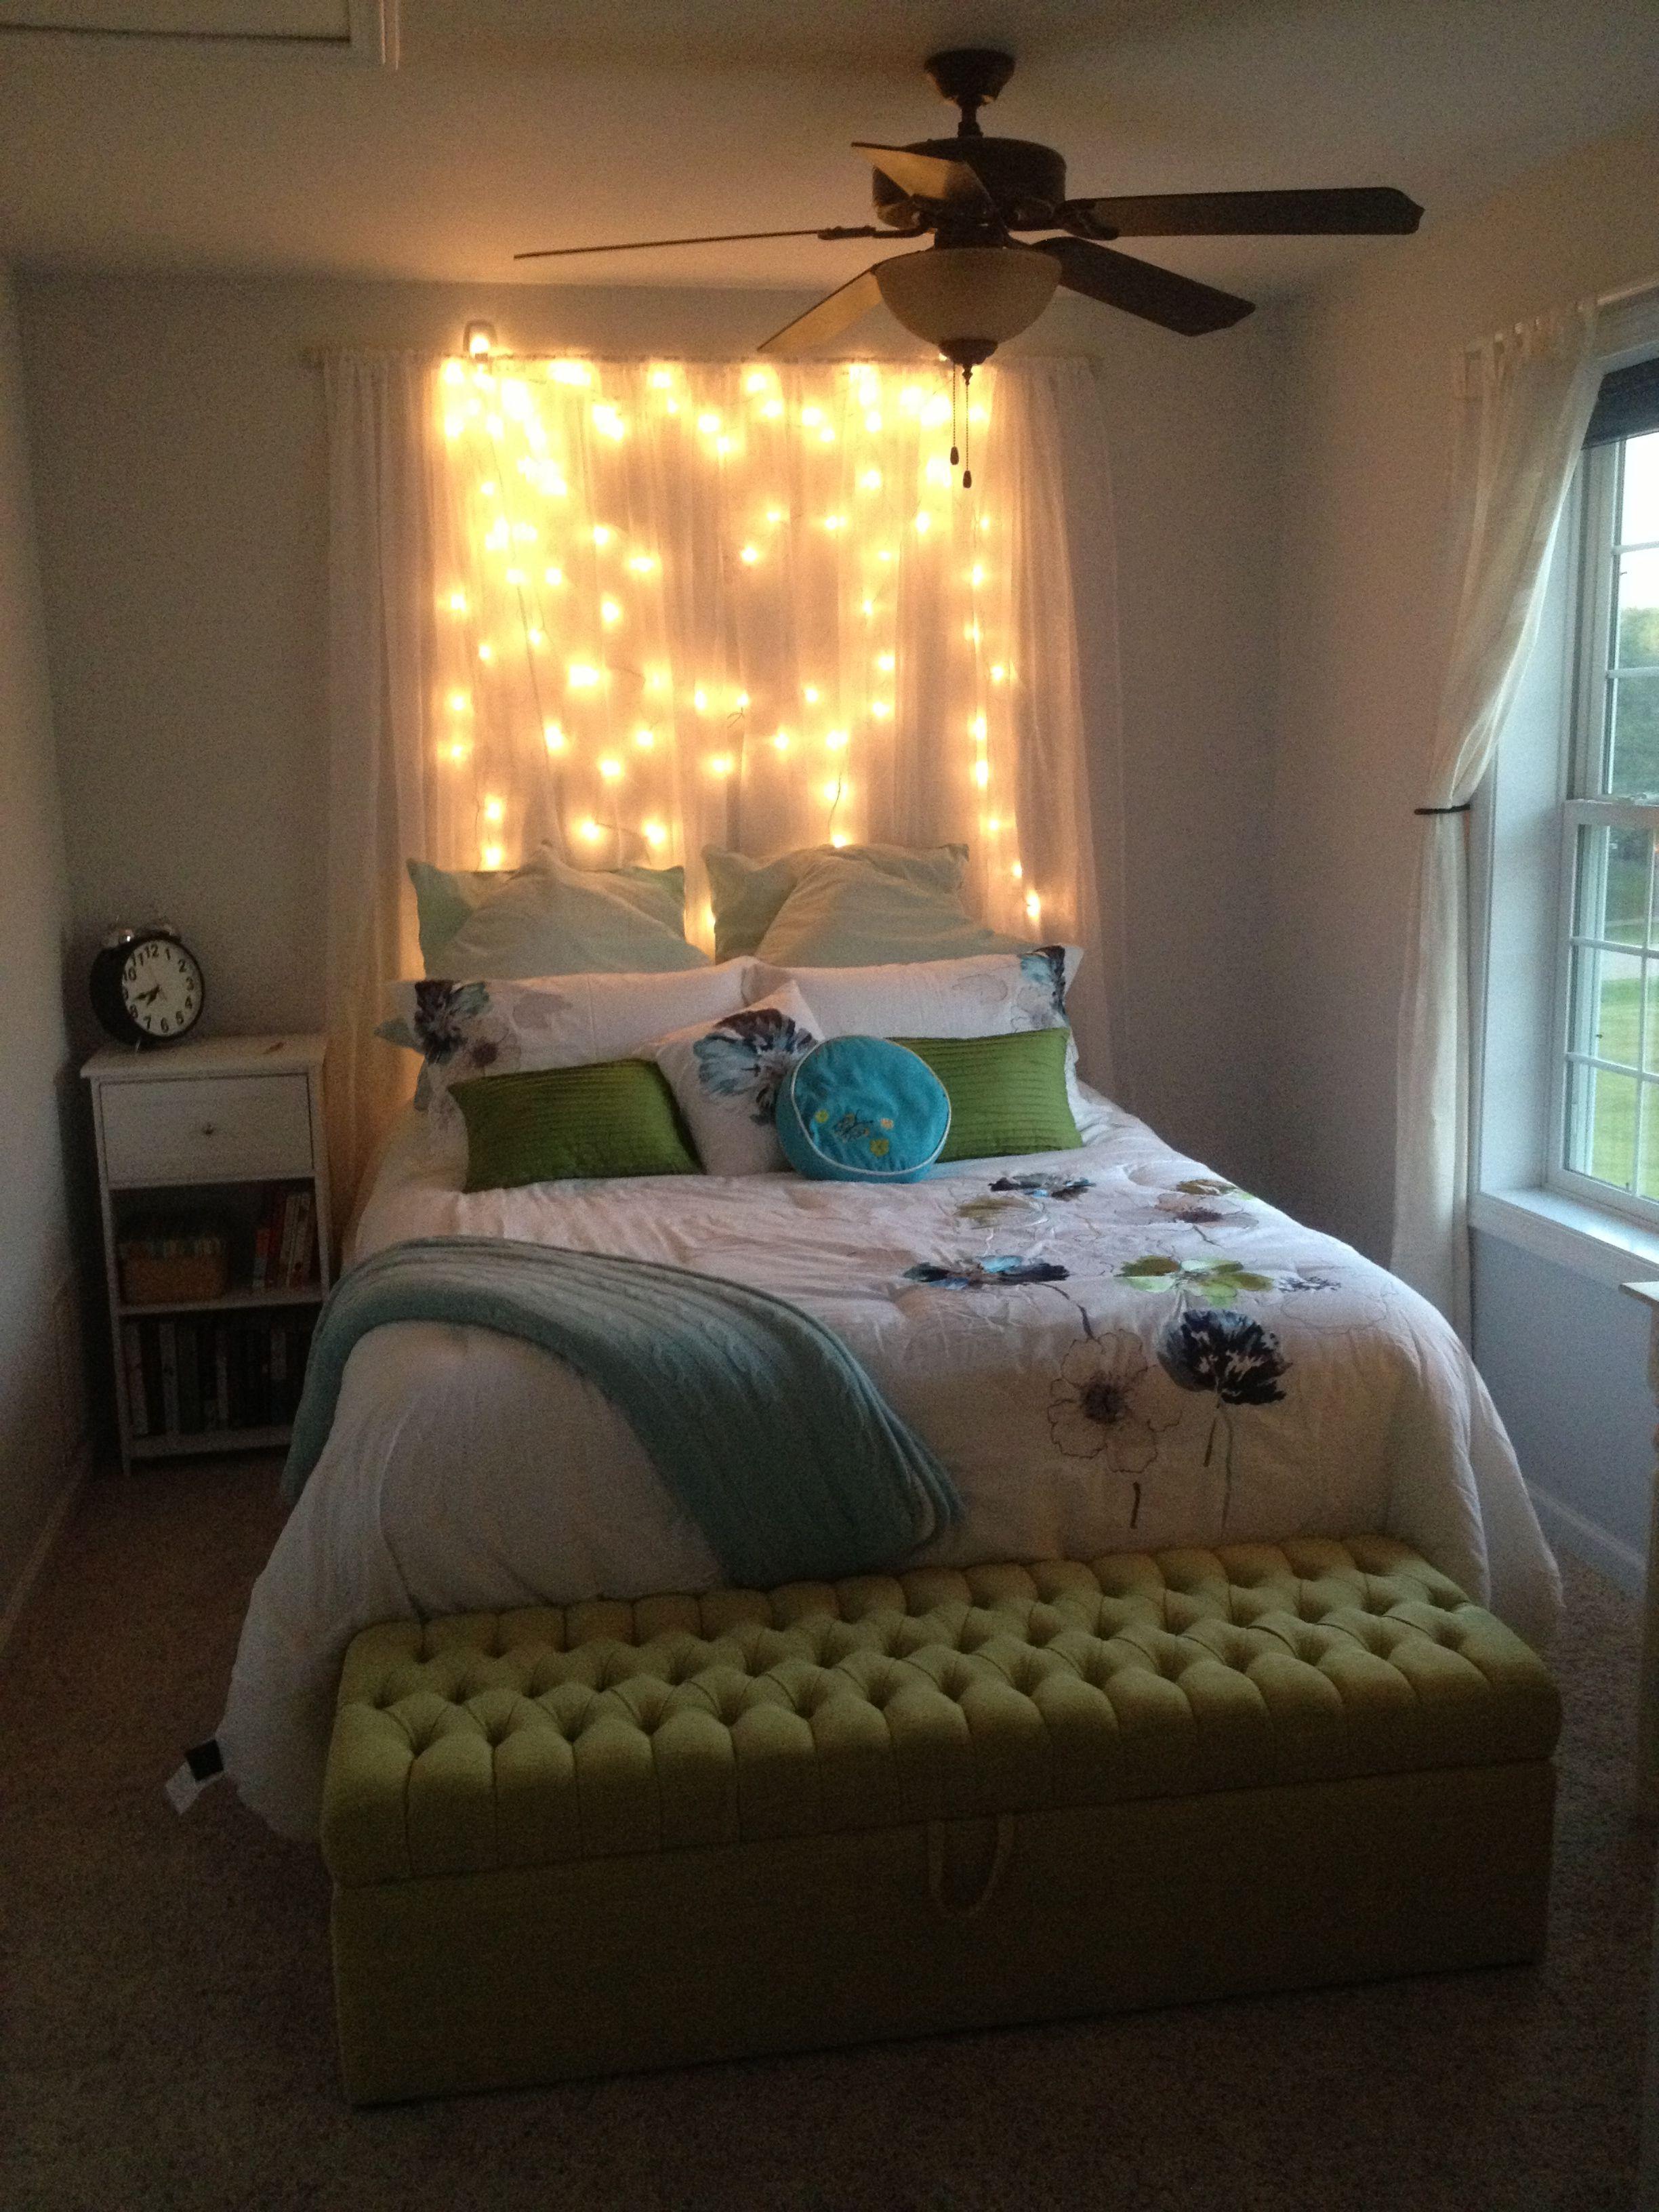 DIY light headboard Just some shear curtains